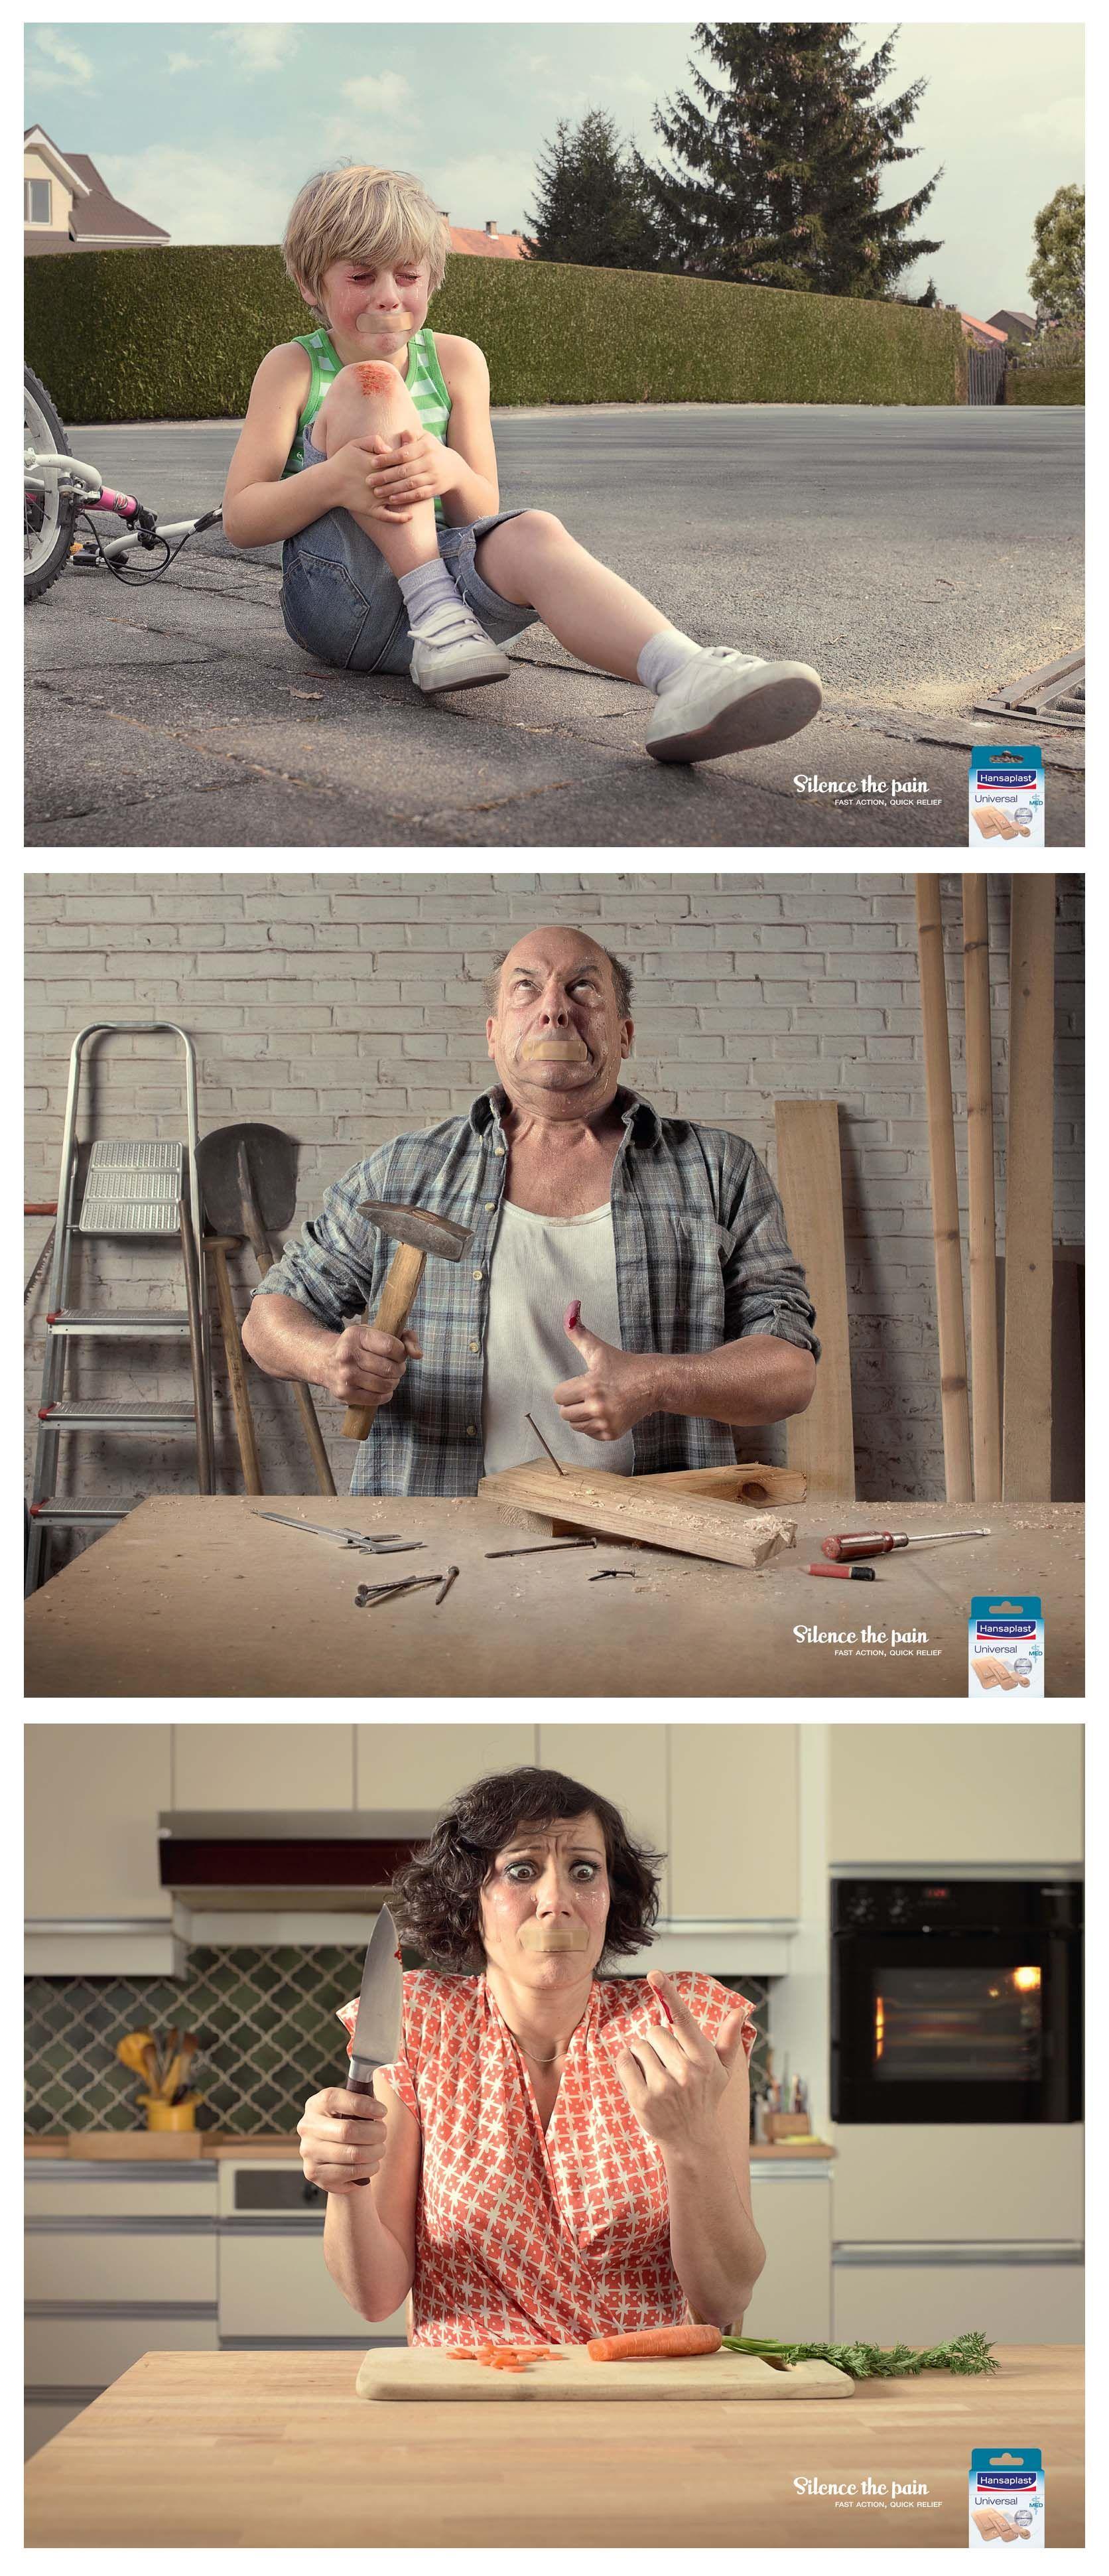 Hansaplast: Silence The Pain Advertising Agency: DDB, Brussels, Belgium Creative Director: Peter Aerts Art Director: Anthony Lamont Copywriter: Gertjan De Smet Photographer: Jeffrey Vanhoutte